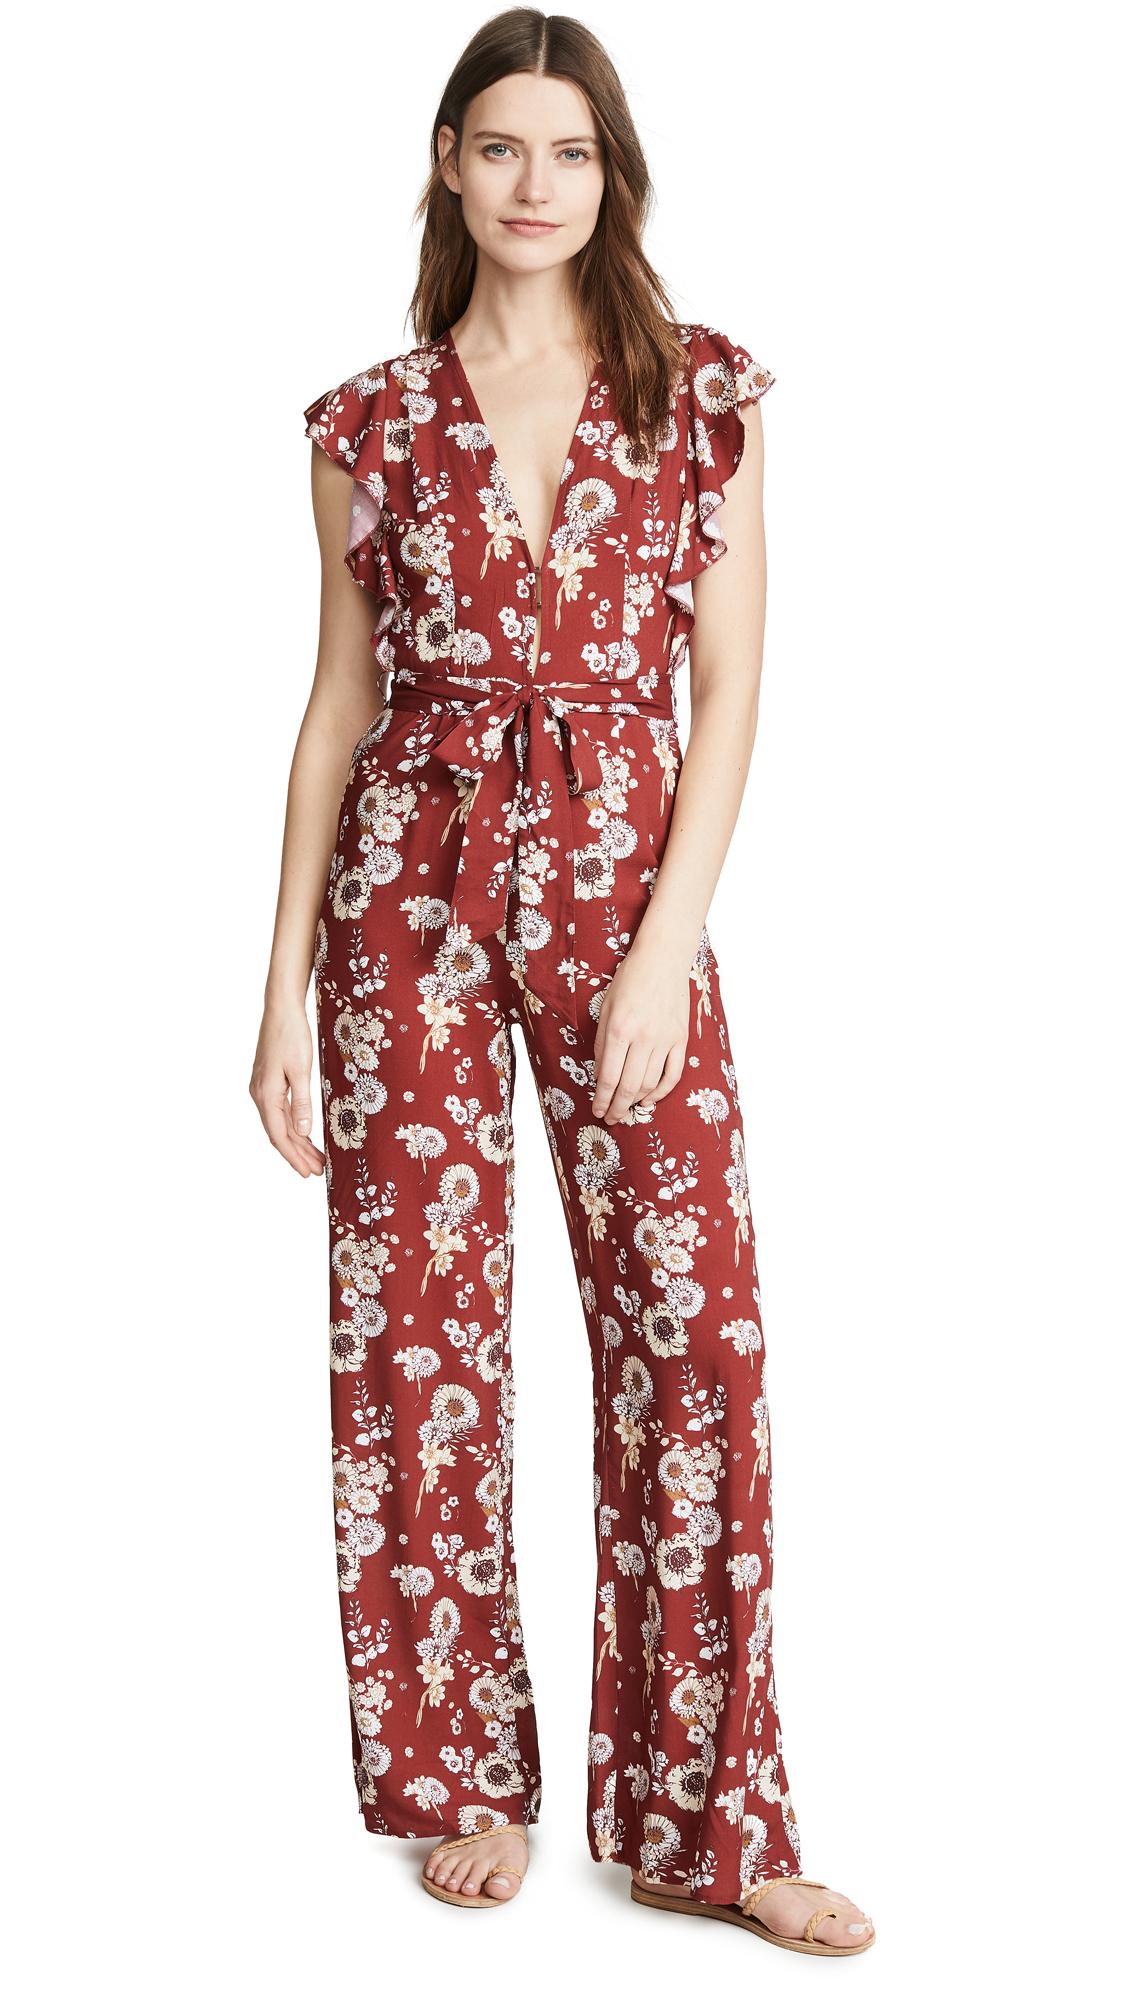 Charlie Holiday Avalon Jumpsuit - Burnt Floral